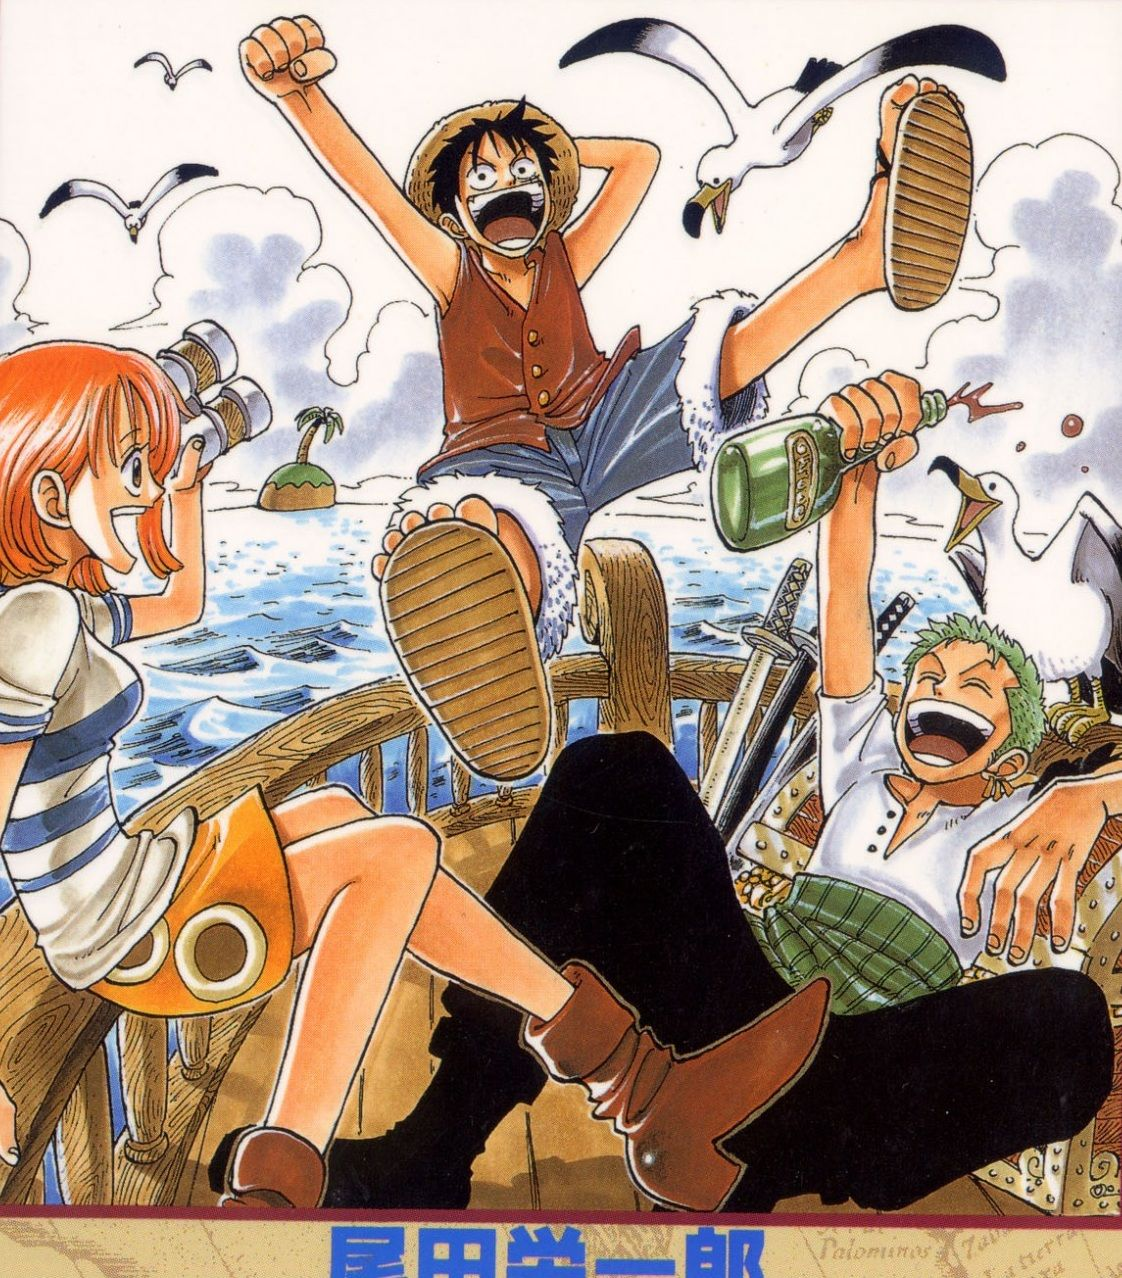 One Piece Manga Luffy, Zoro, and Nami. One piece manga